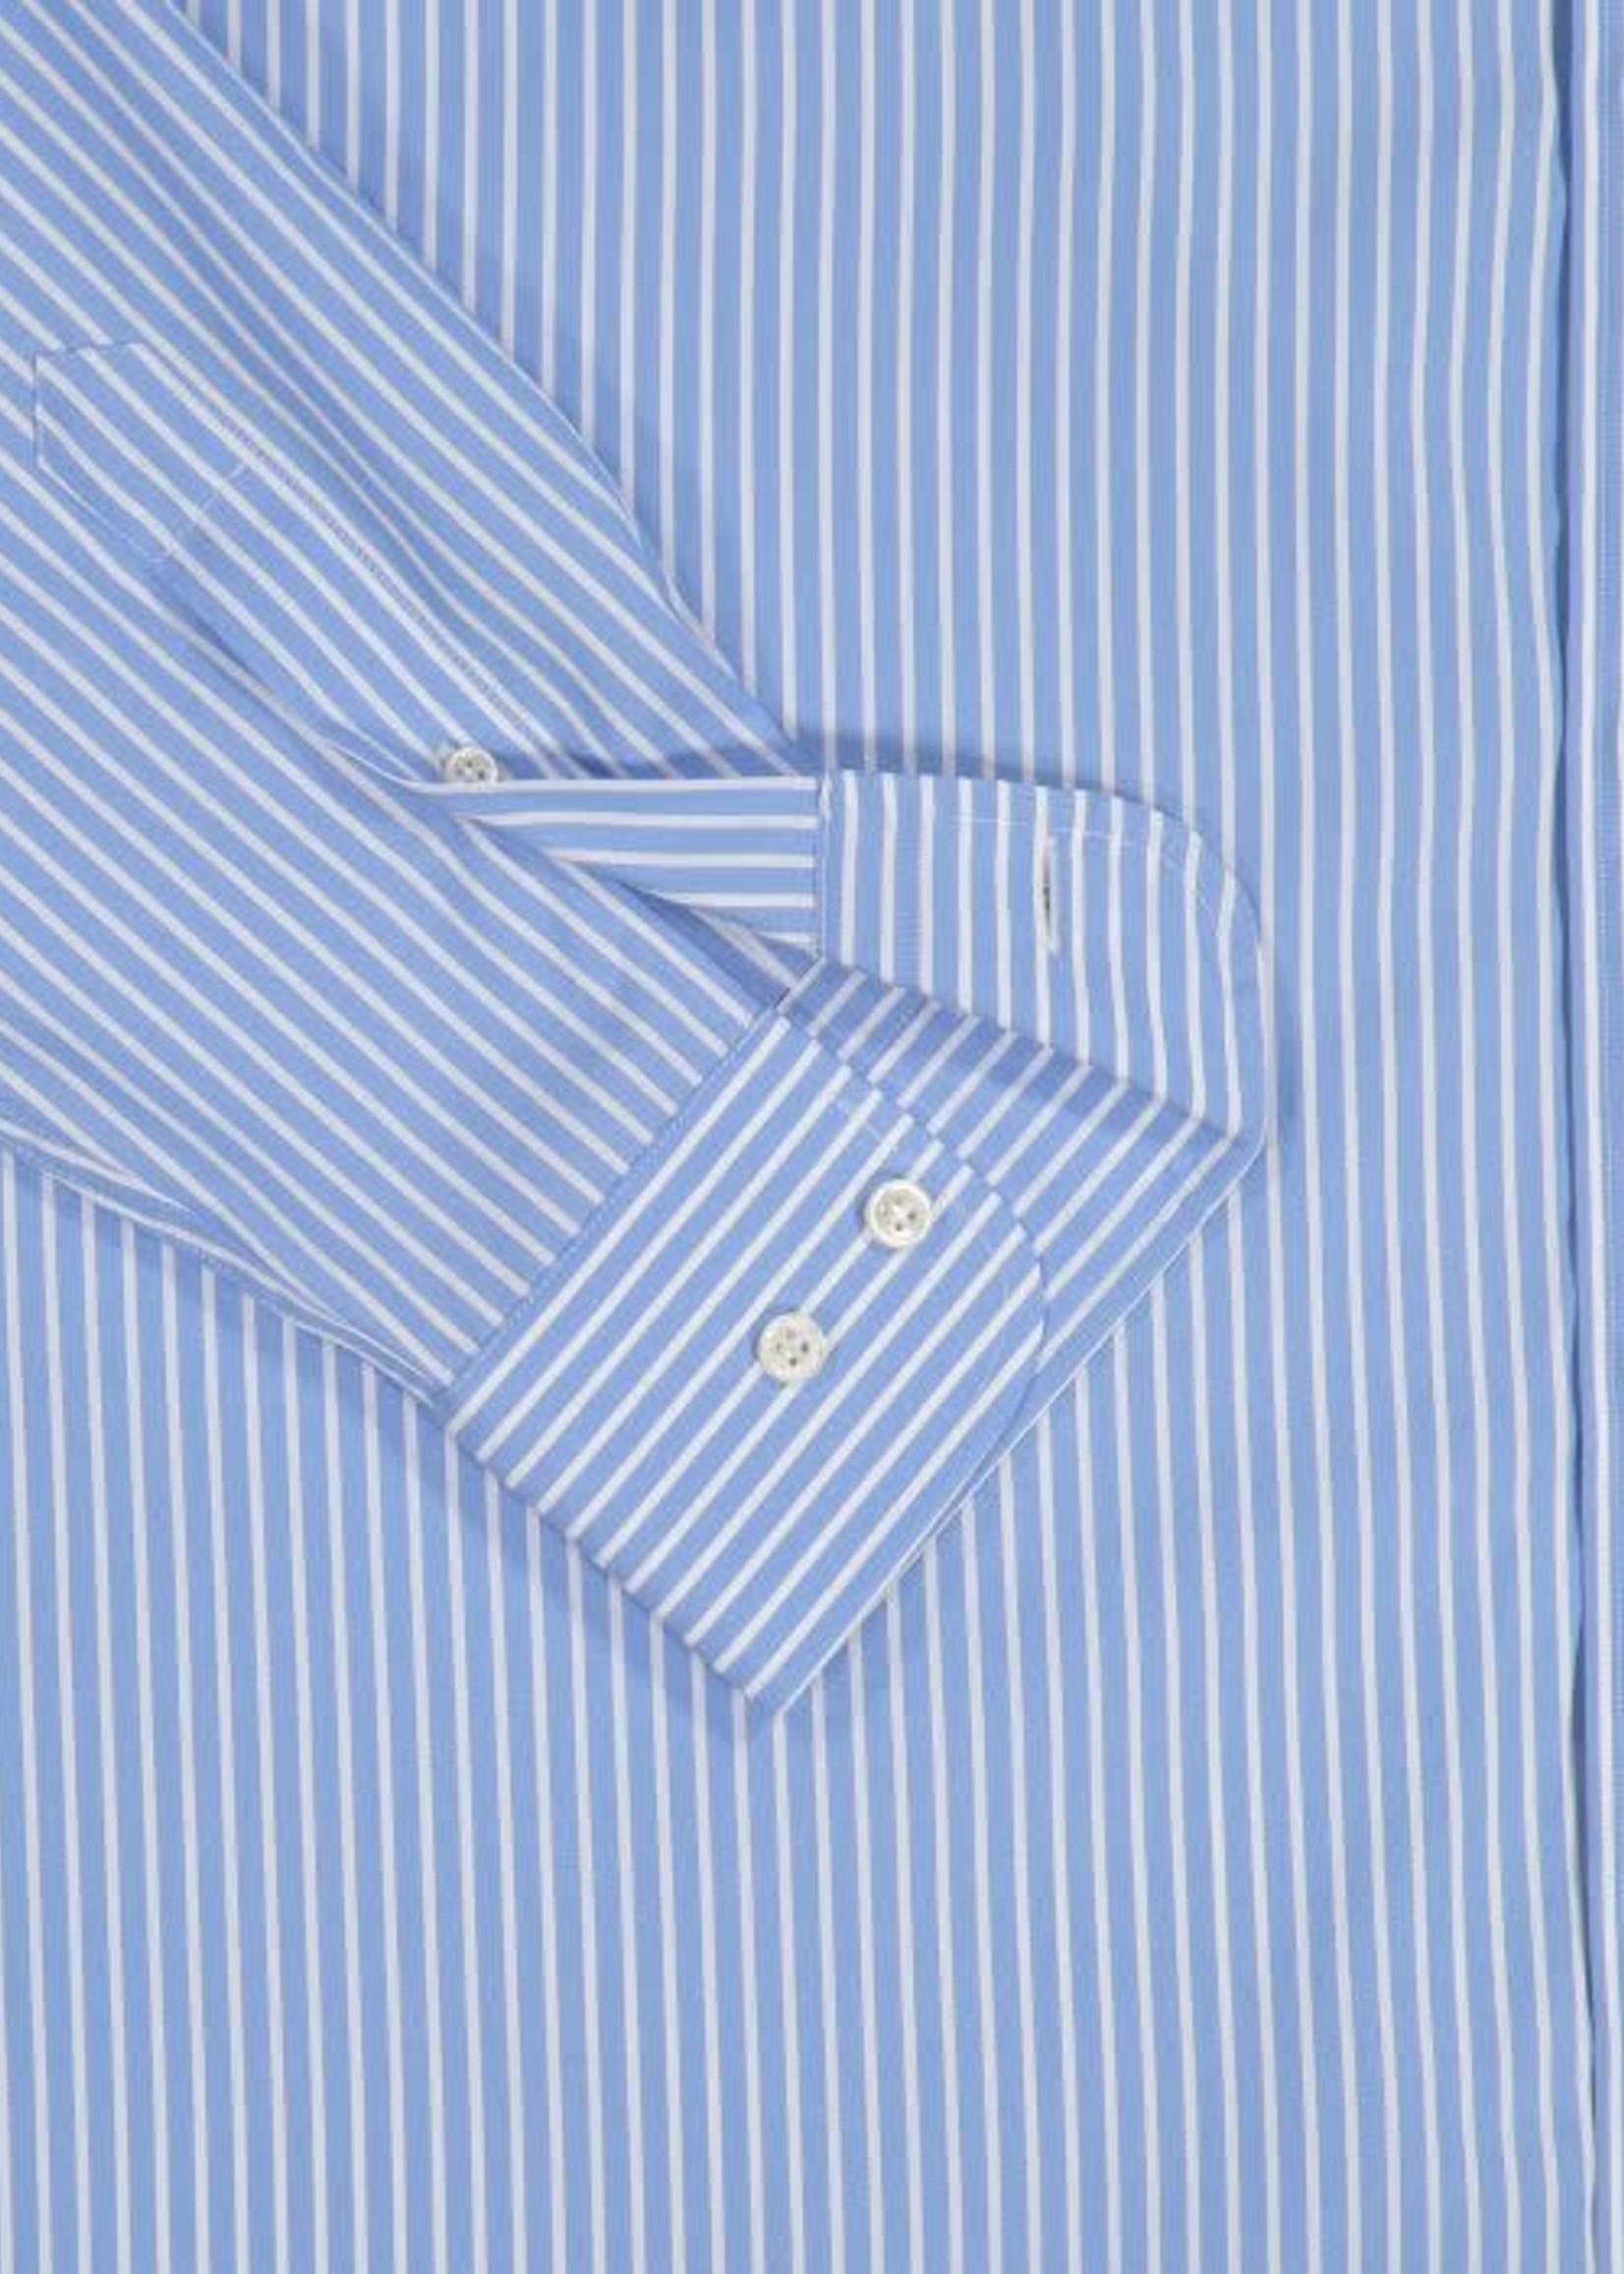 Paul & Shark Paul & Shark Overhemd Blauw Wit Gestreept Easy Care